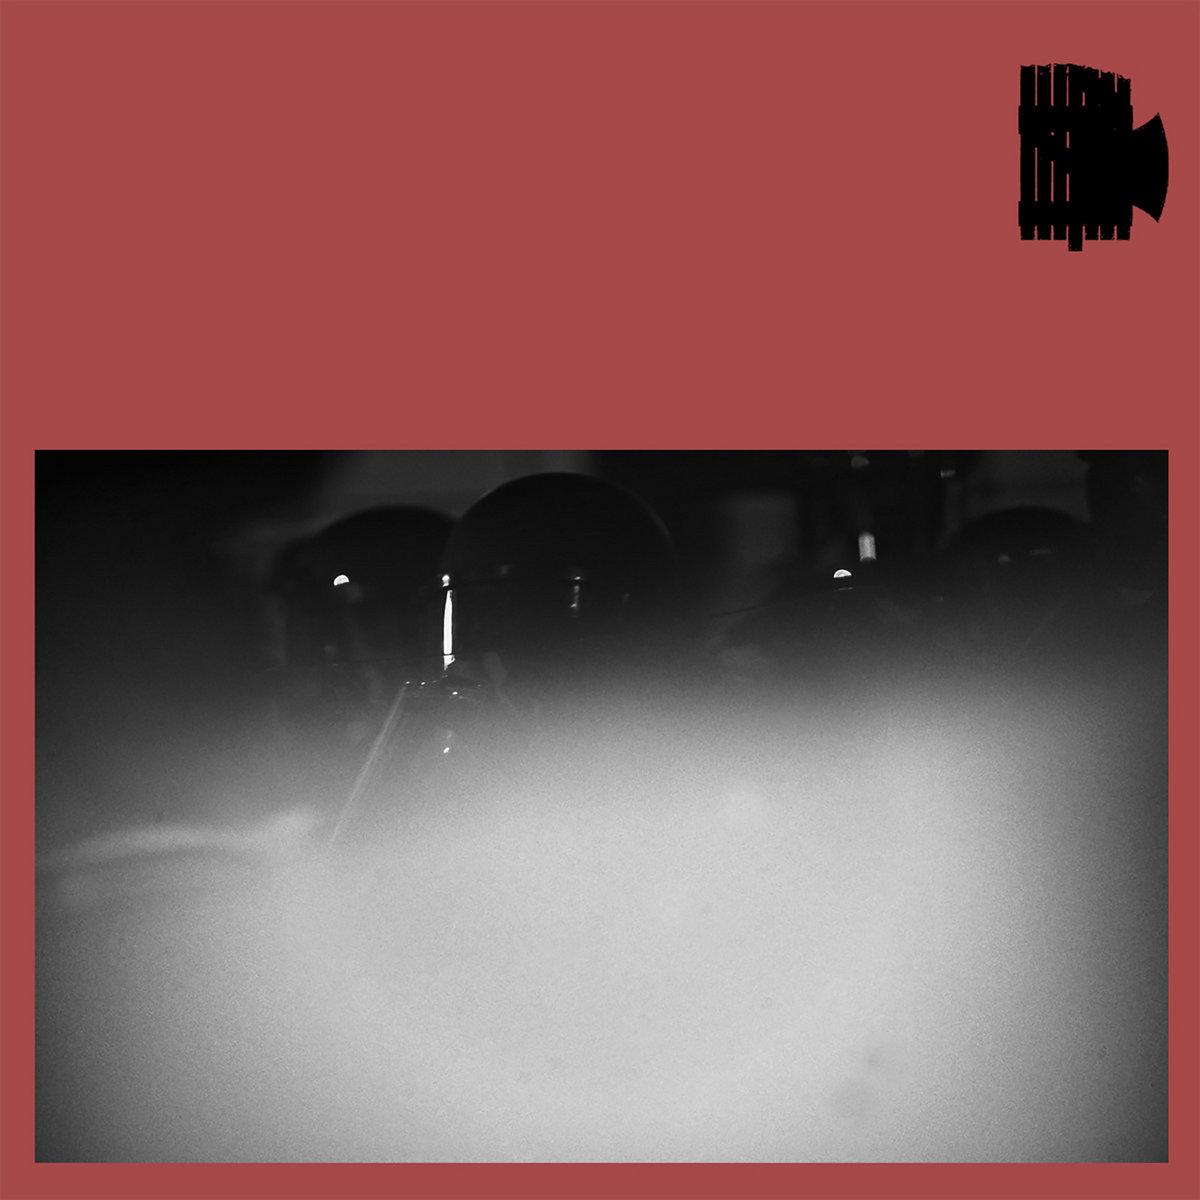 Axebreaker Album Cover